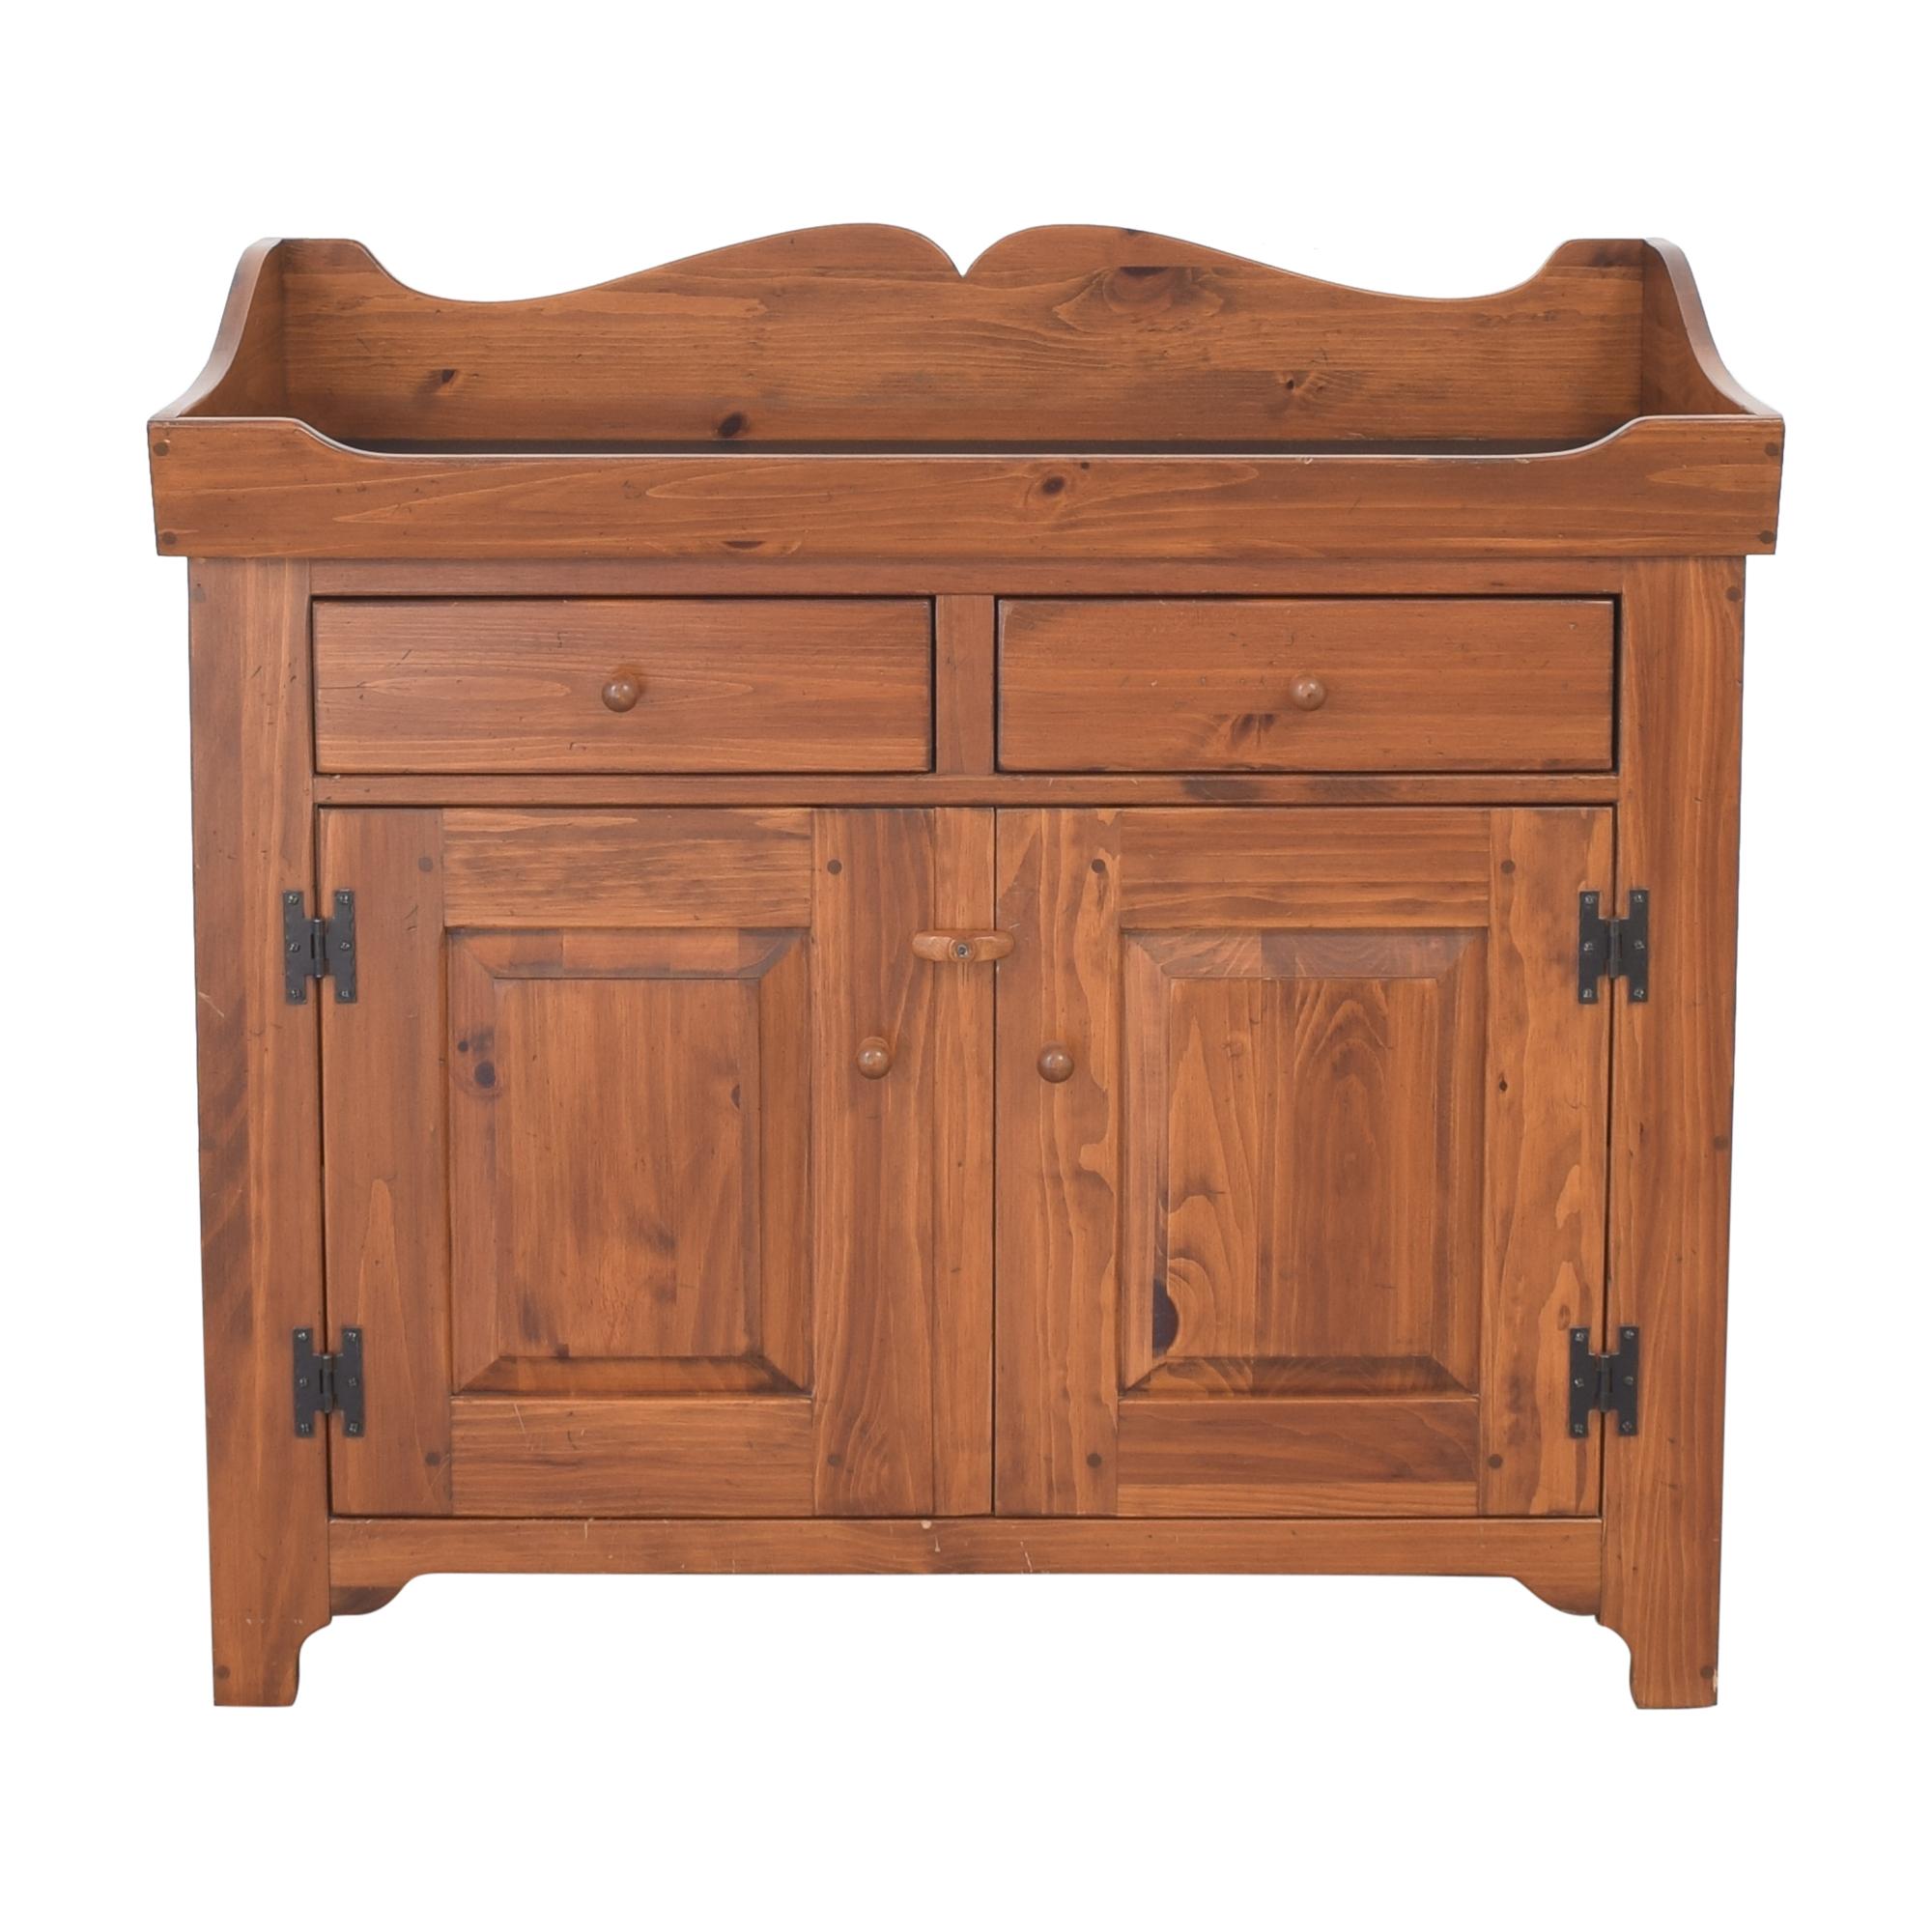 Ethan Allen Buffet Sideboard / Cabinets & Sideboards